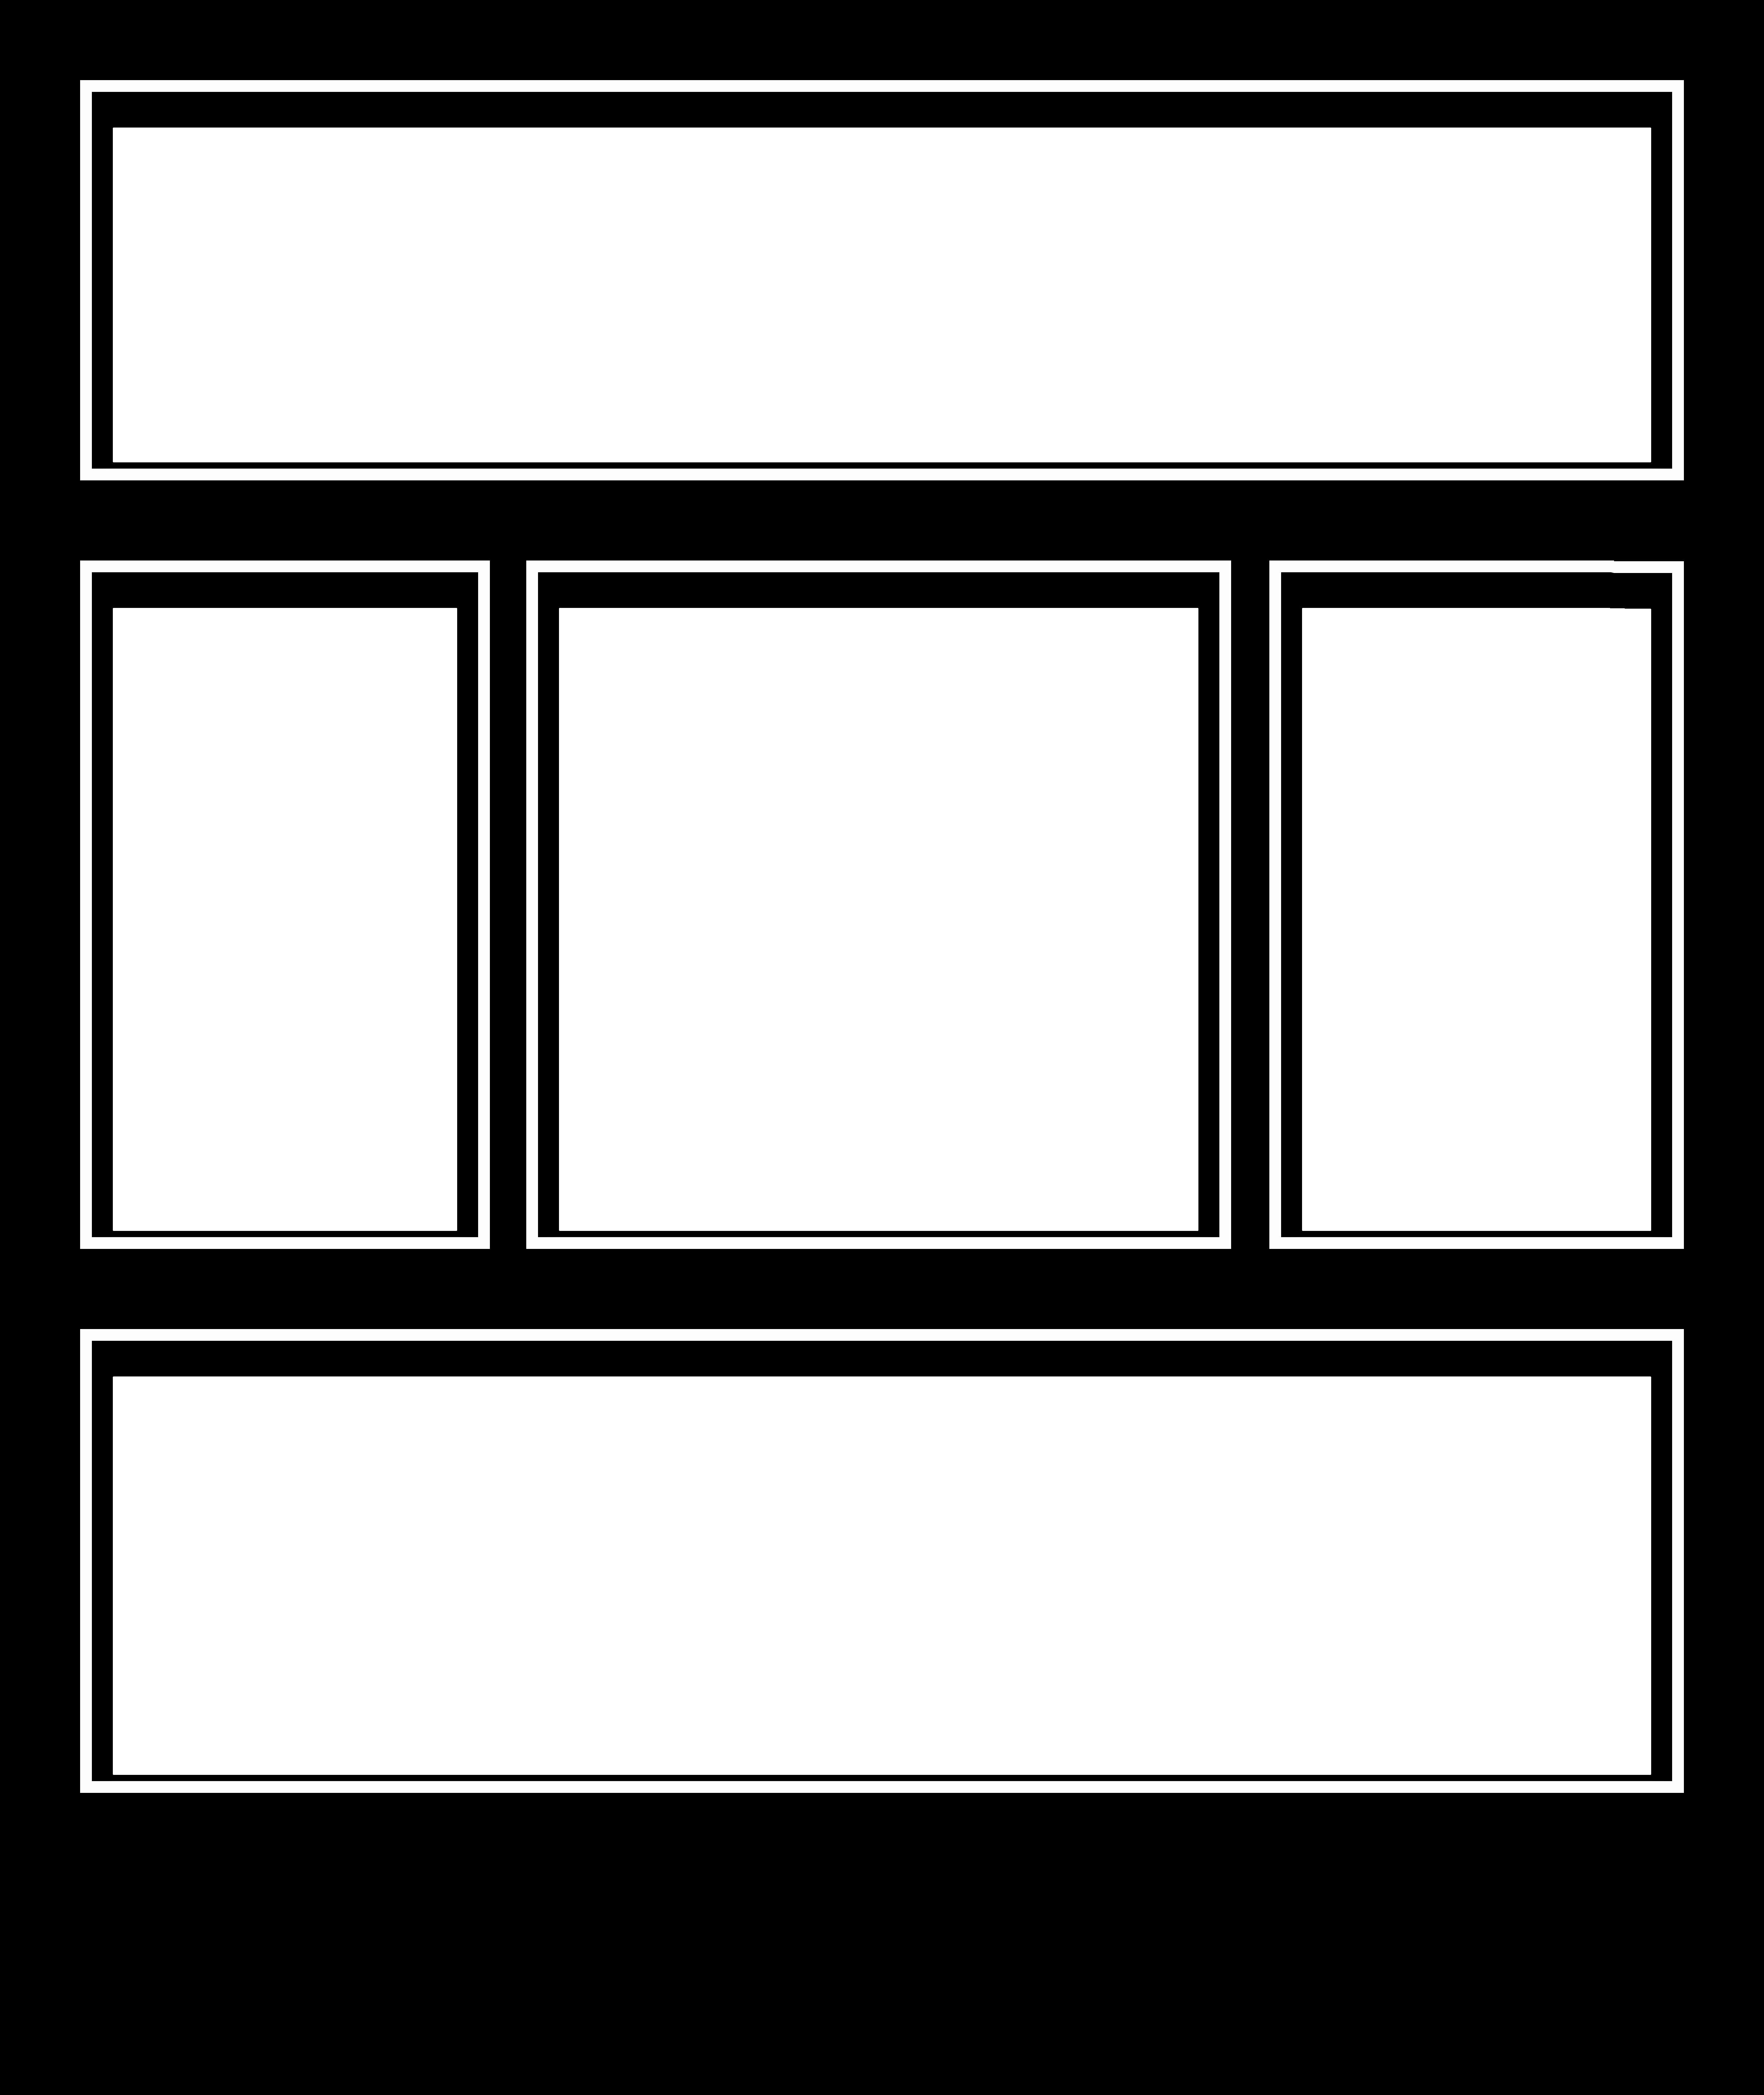 Photoshop Picture Frame Template Unique 18 Of Transparent Collage Frames Shop Template